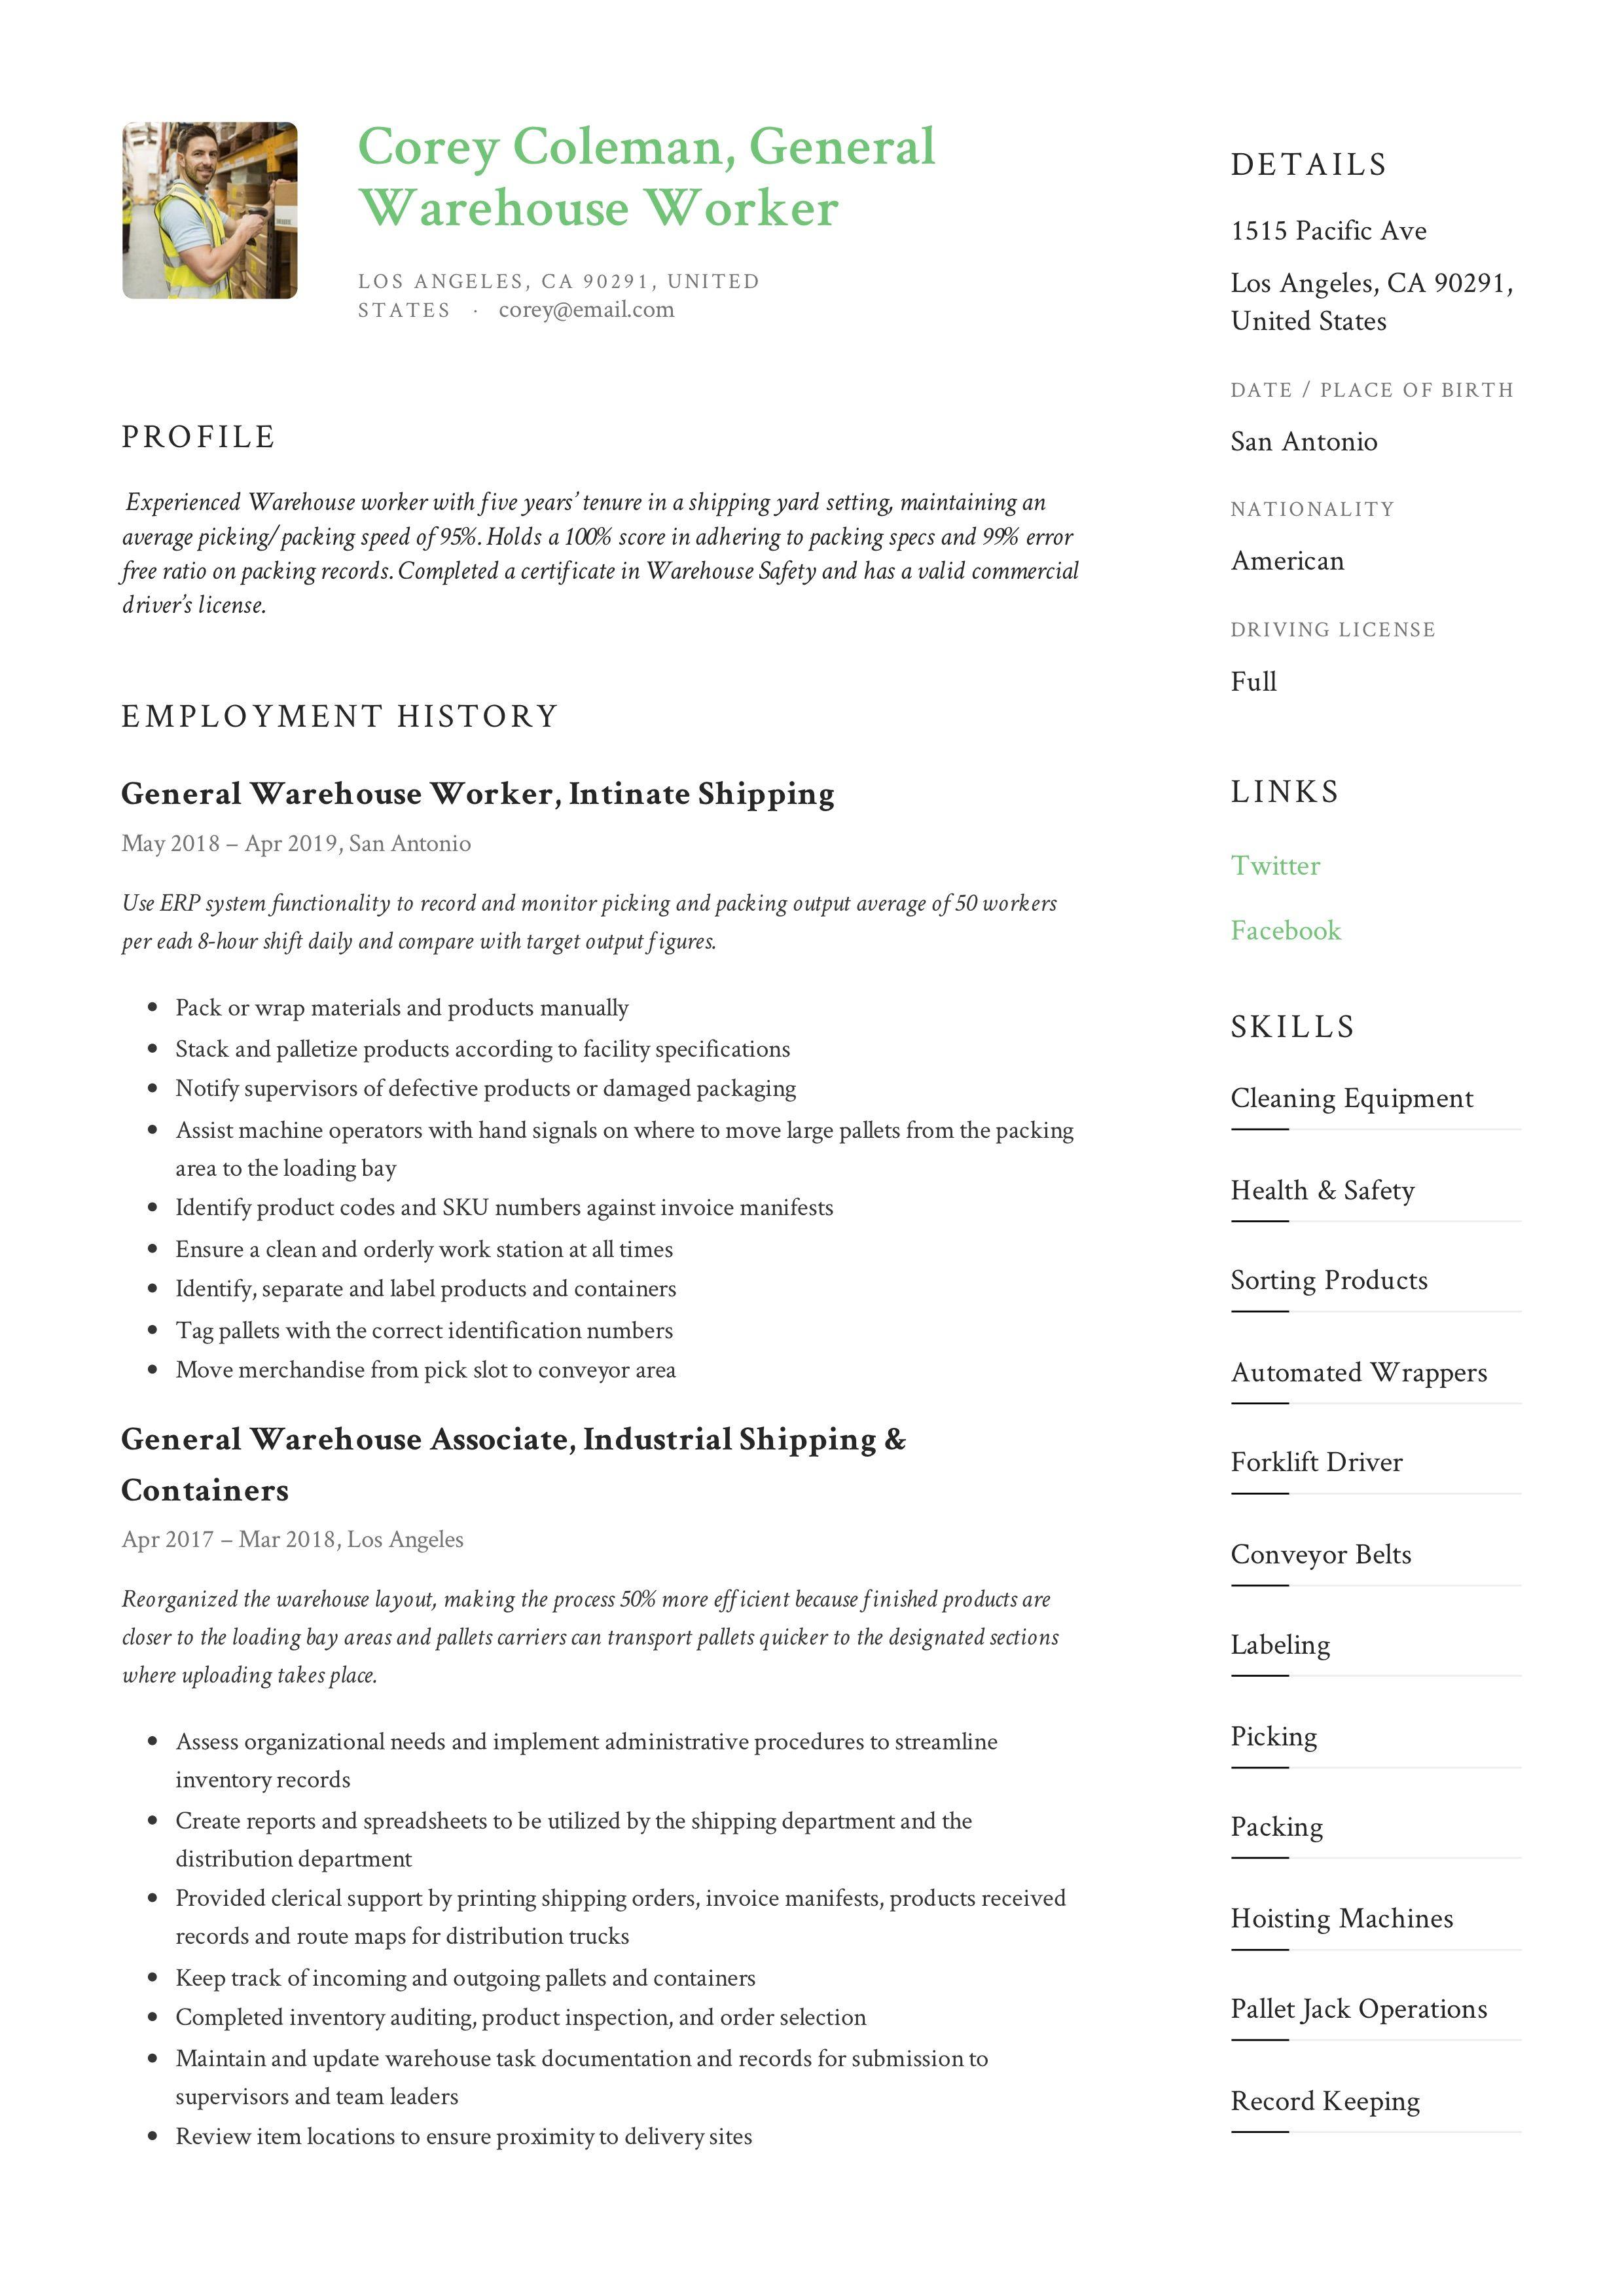 General warehouse worker resume example in 2020 resume